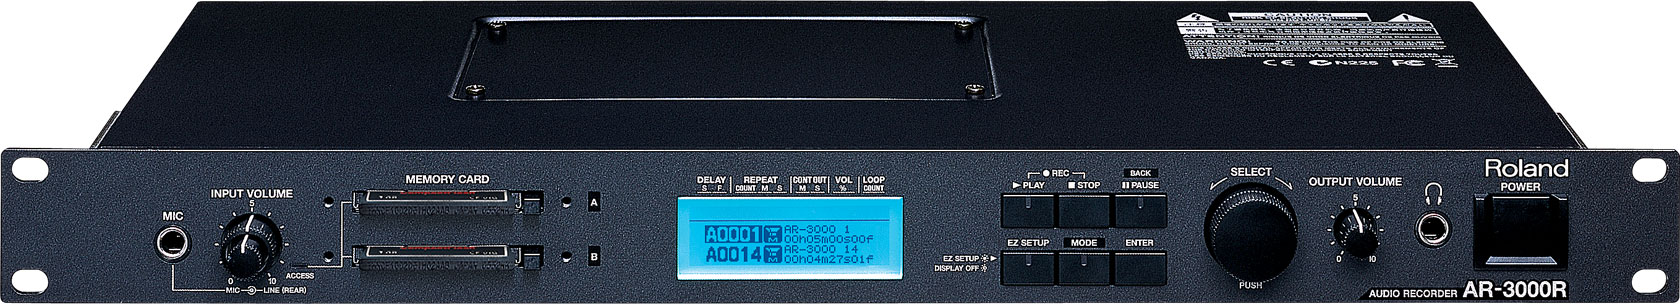 ROLAND AR-3000 RECORDER DRIVER FOR WINDOWS 7